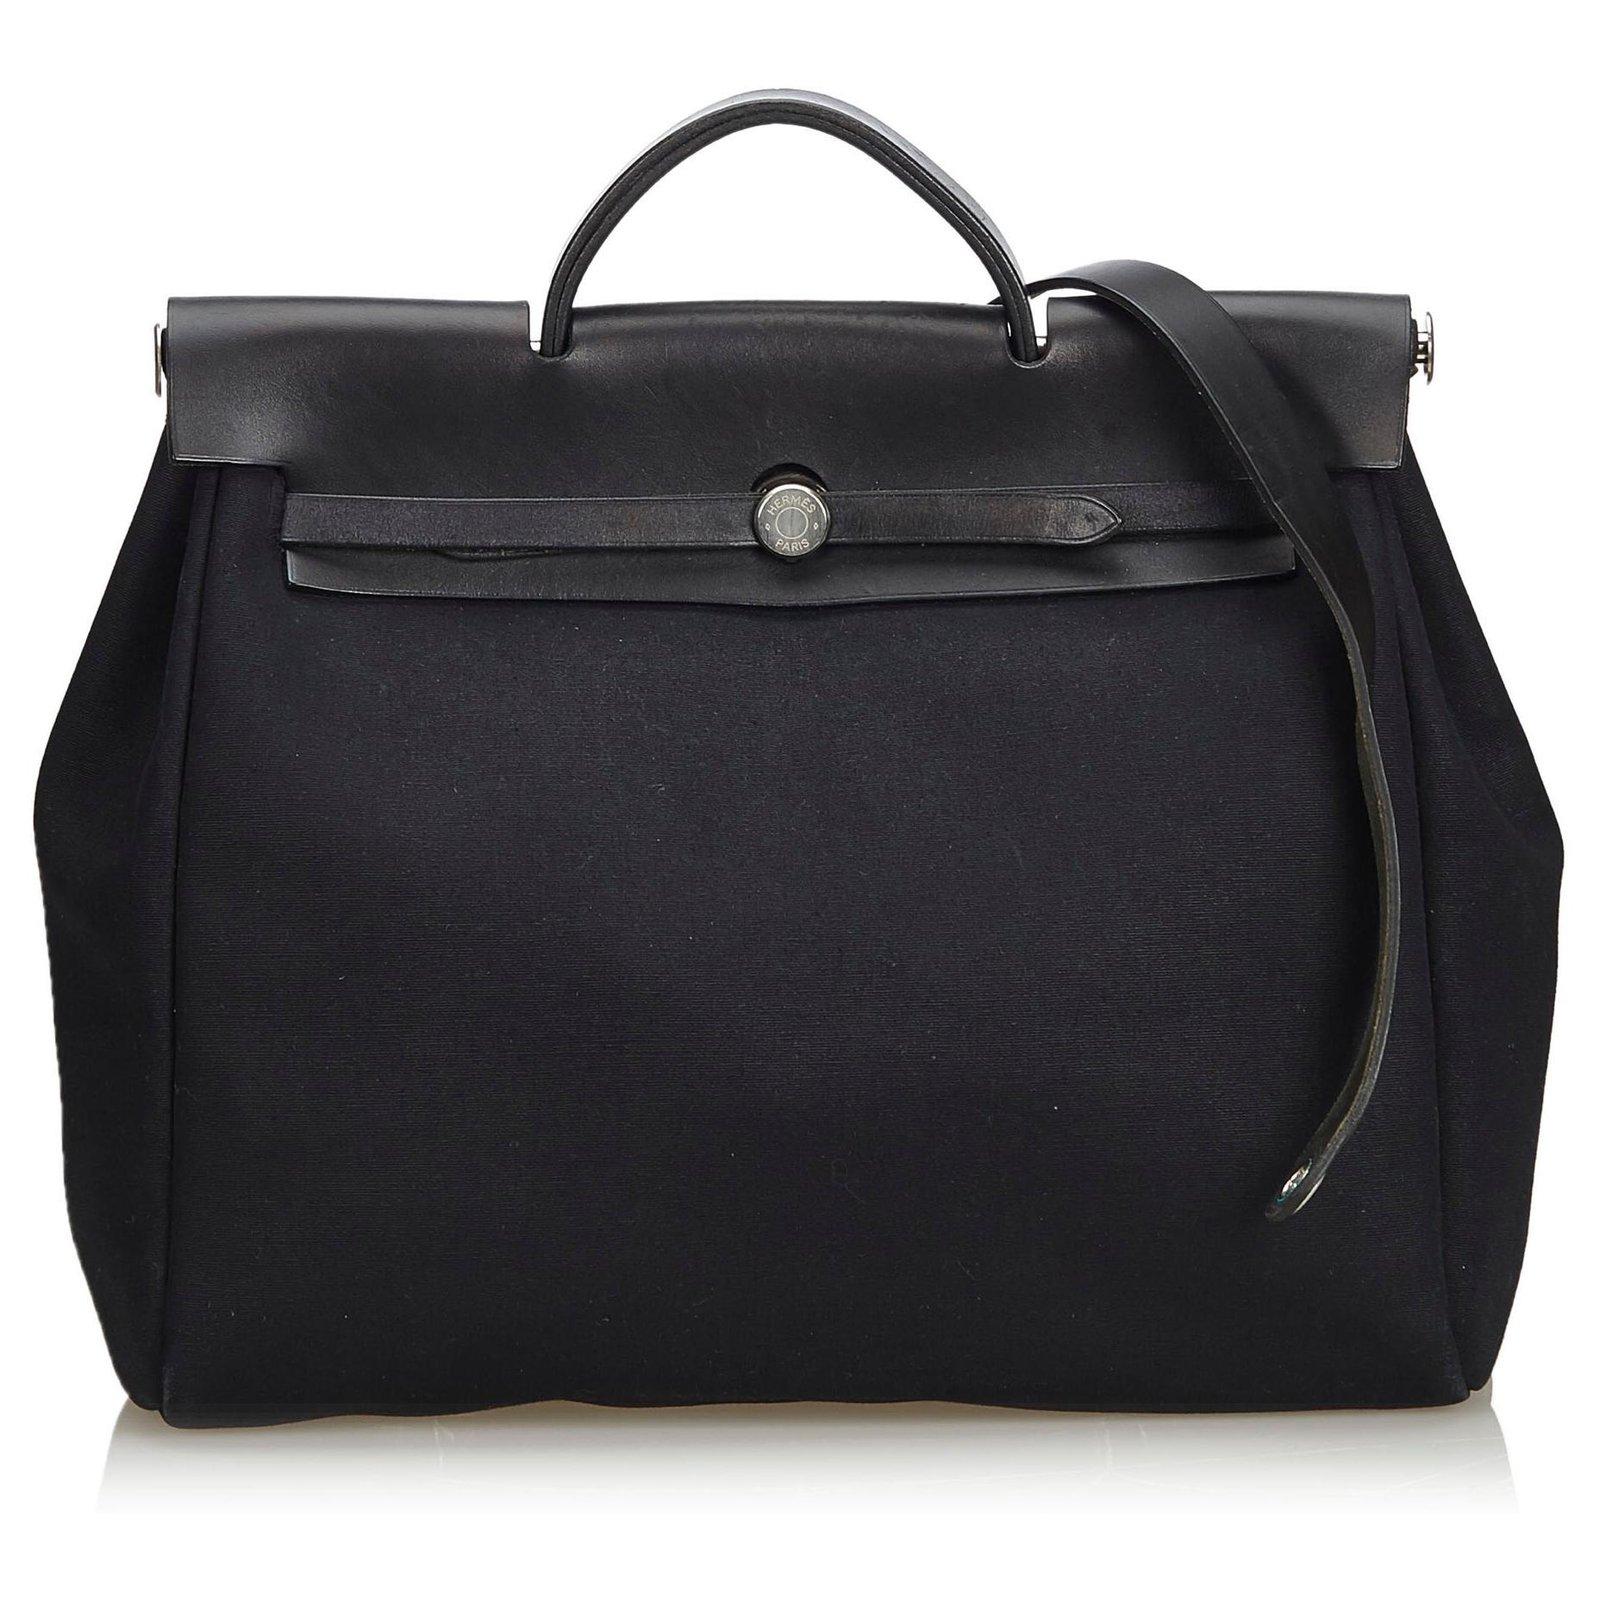 0f516ad04 Hermès Hermes Black Canvas Herbag MM Satchel Handbags Leather,Other,Cloth,Cloth  Black